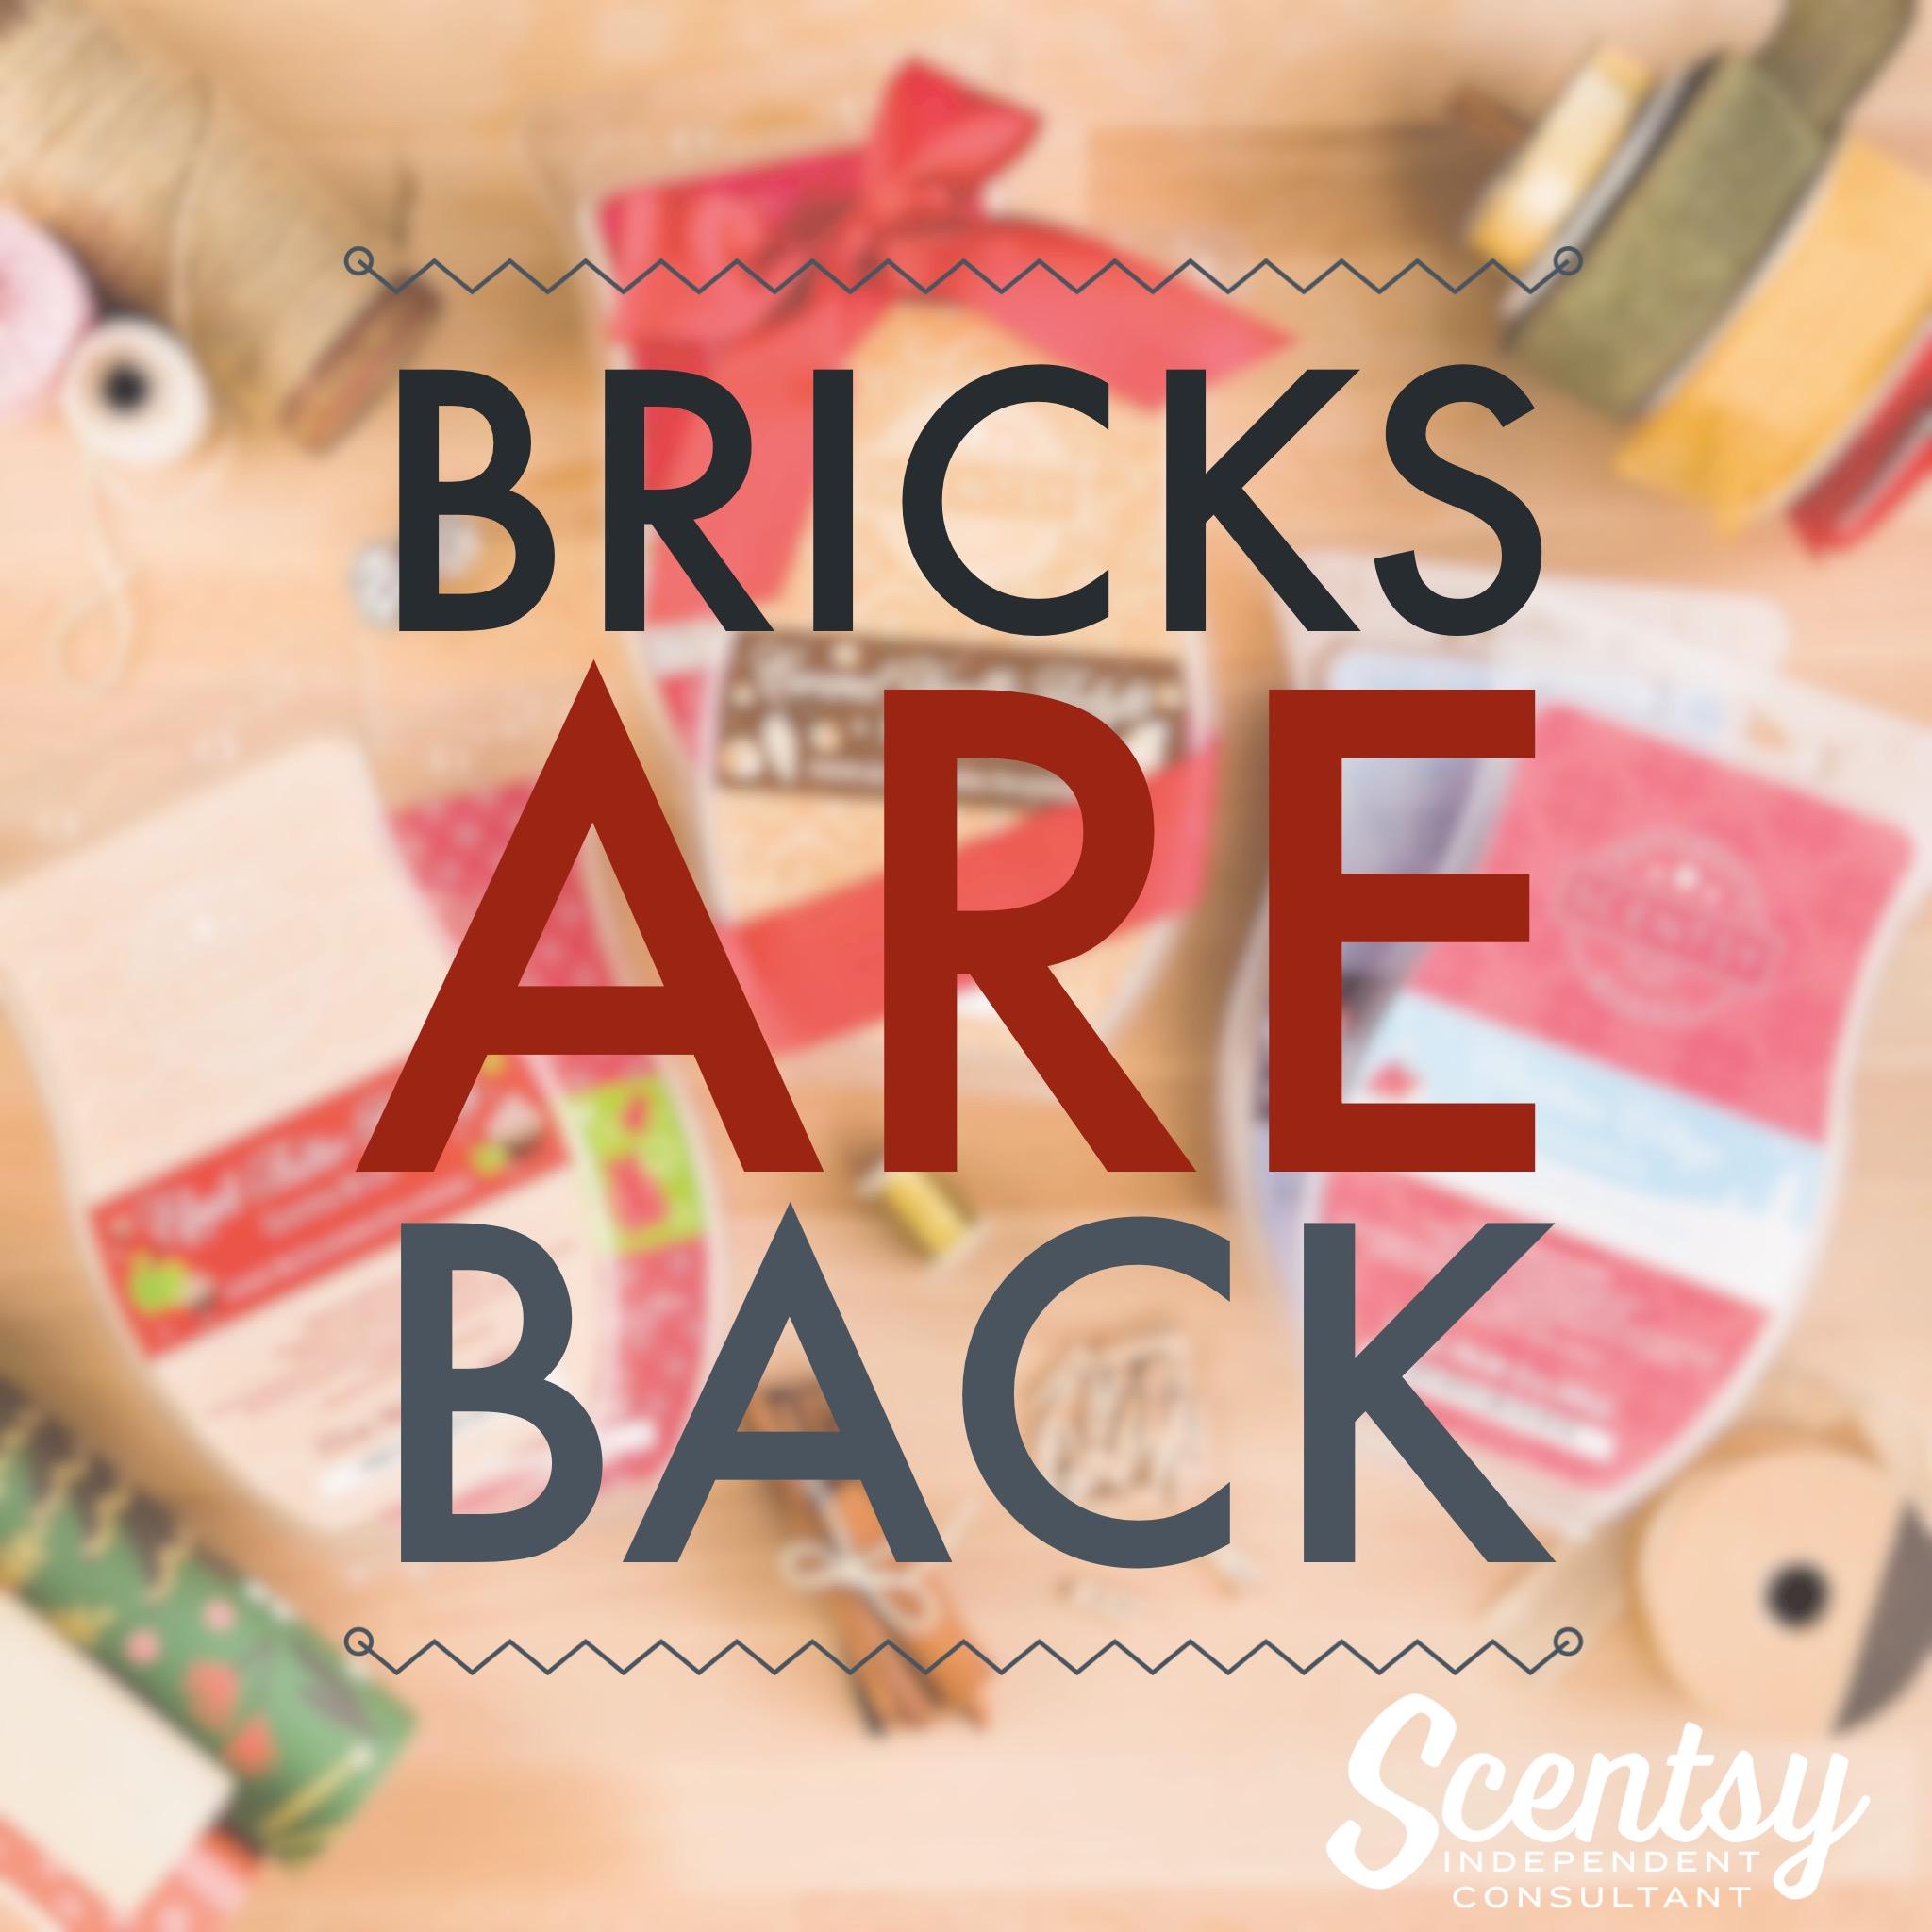 Scentsy Bricks - Valencia Scentsy Consultant - melissa dell